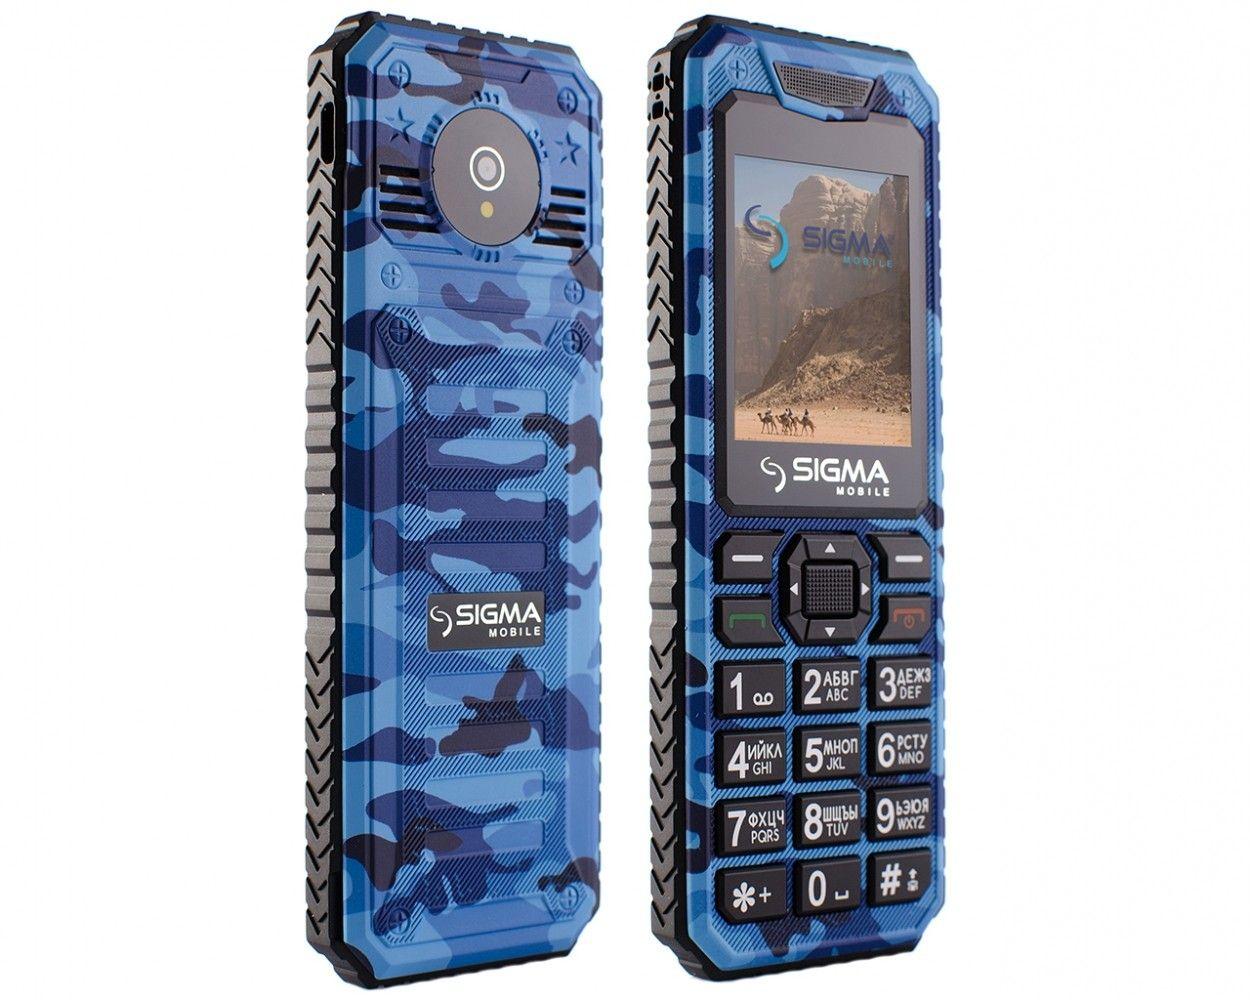 Мобильный телефон Sigma mobile X-style 11 Dragon Blue Camouflage - 2